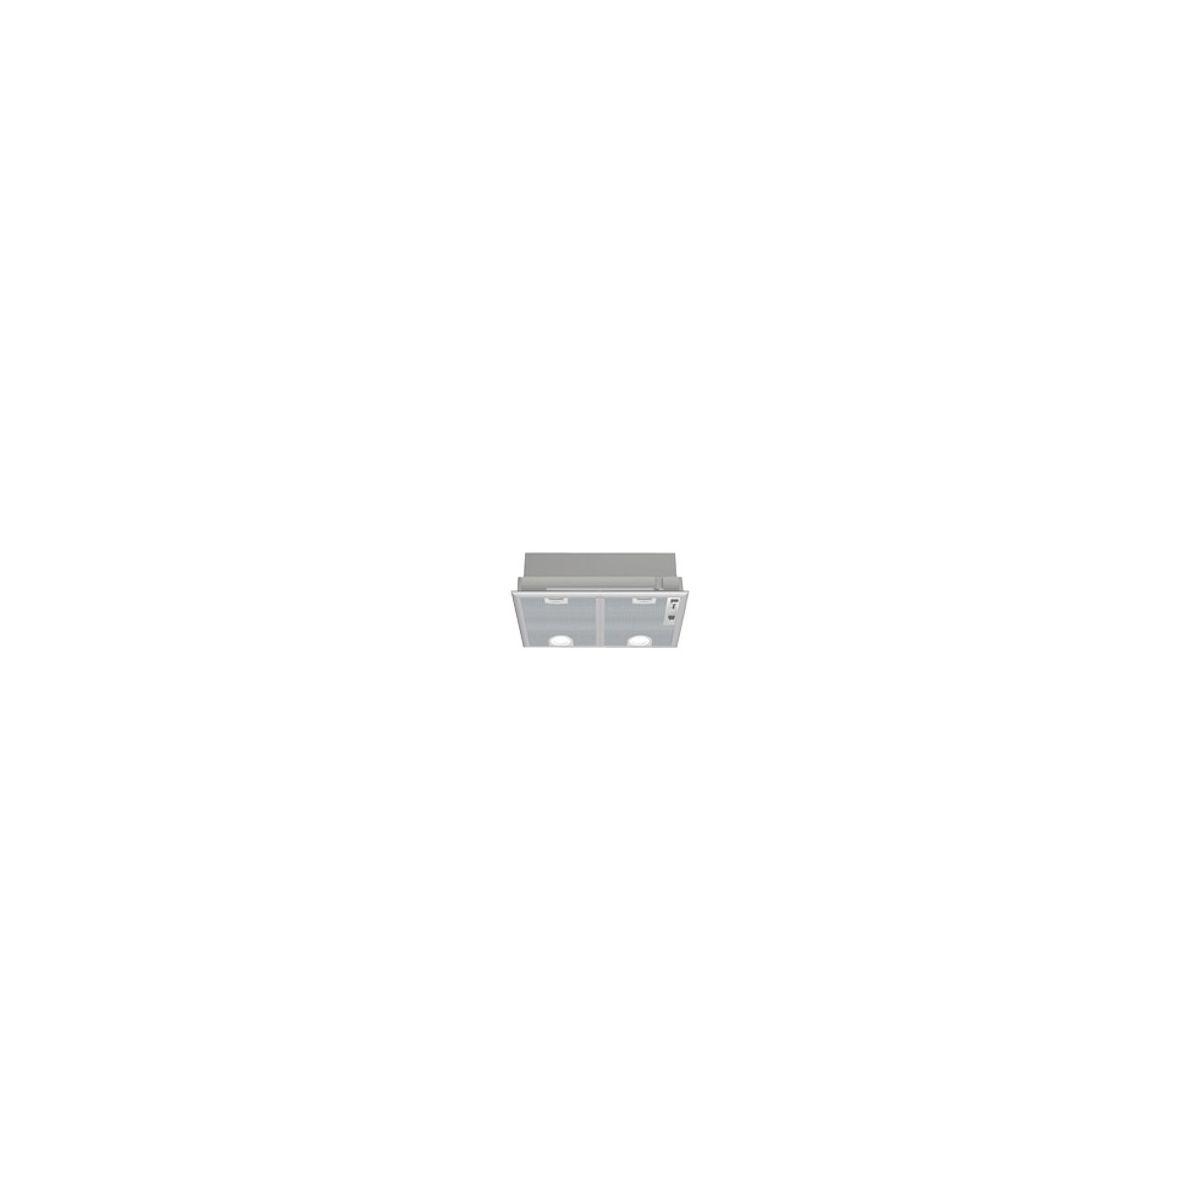 Groupe aspirant ou filtrant bosch dhl555b - livraison offerte : code livp (photo)